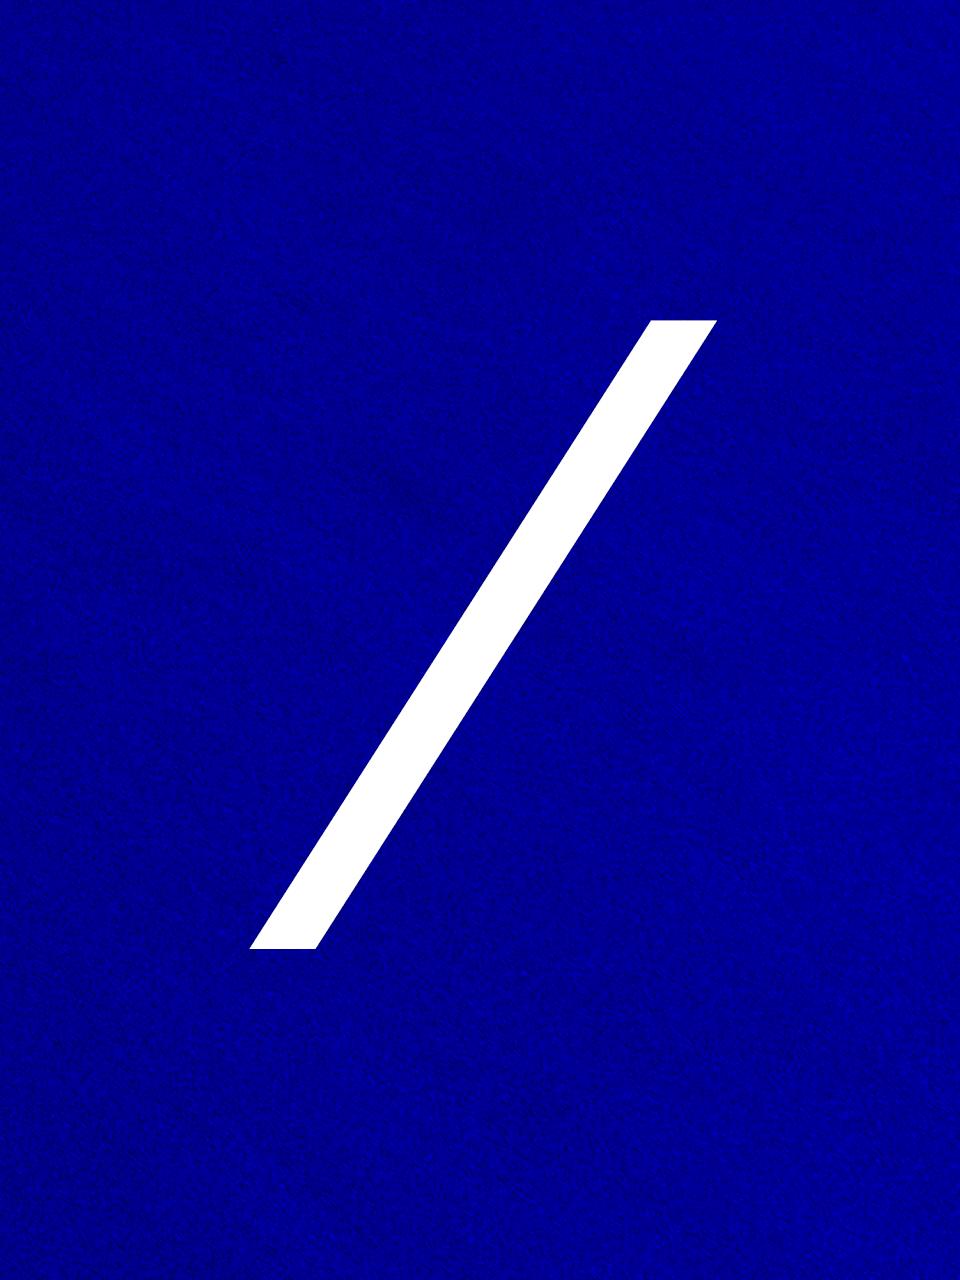 aros-jorn-kirkeby-book-graphic-02-ian-bennett